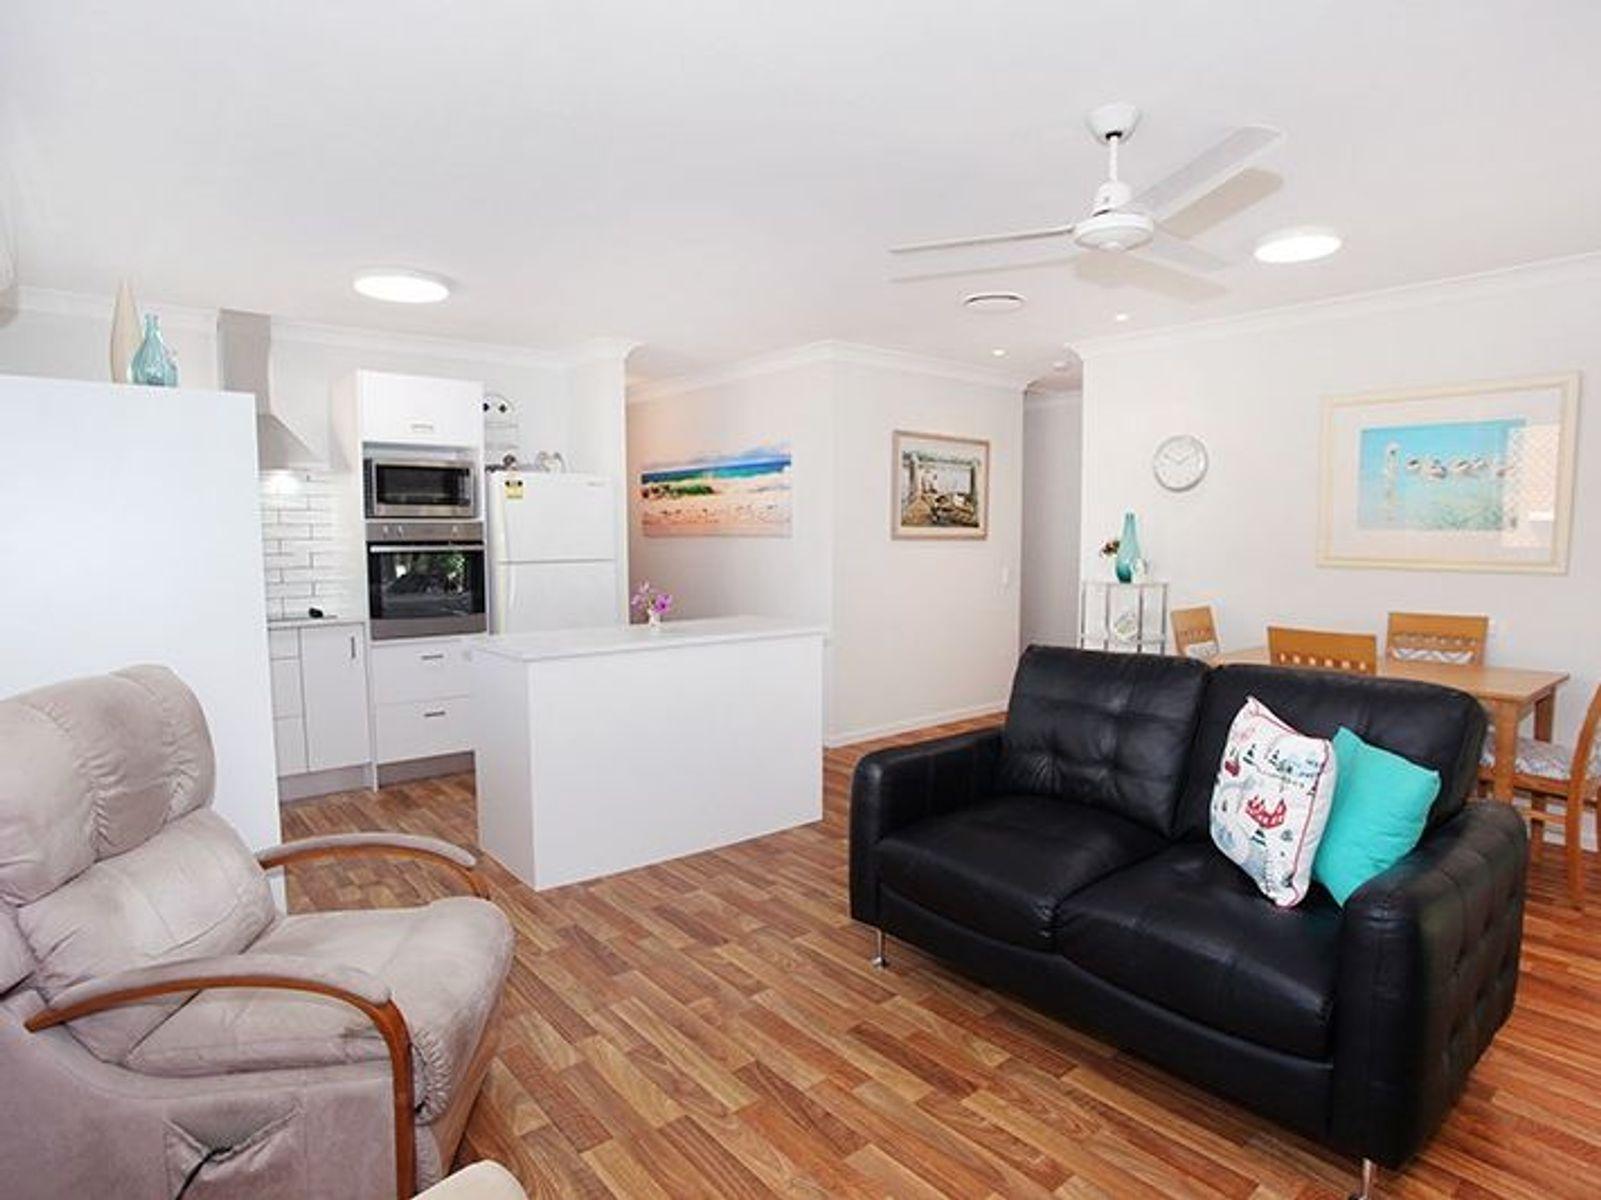 64/18 Doolan St, Nambour, QLD 4560